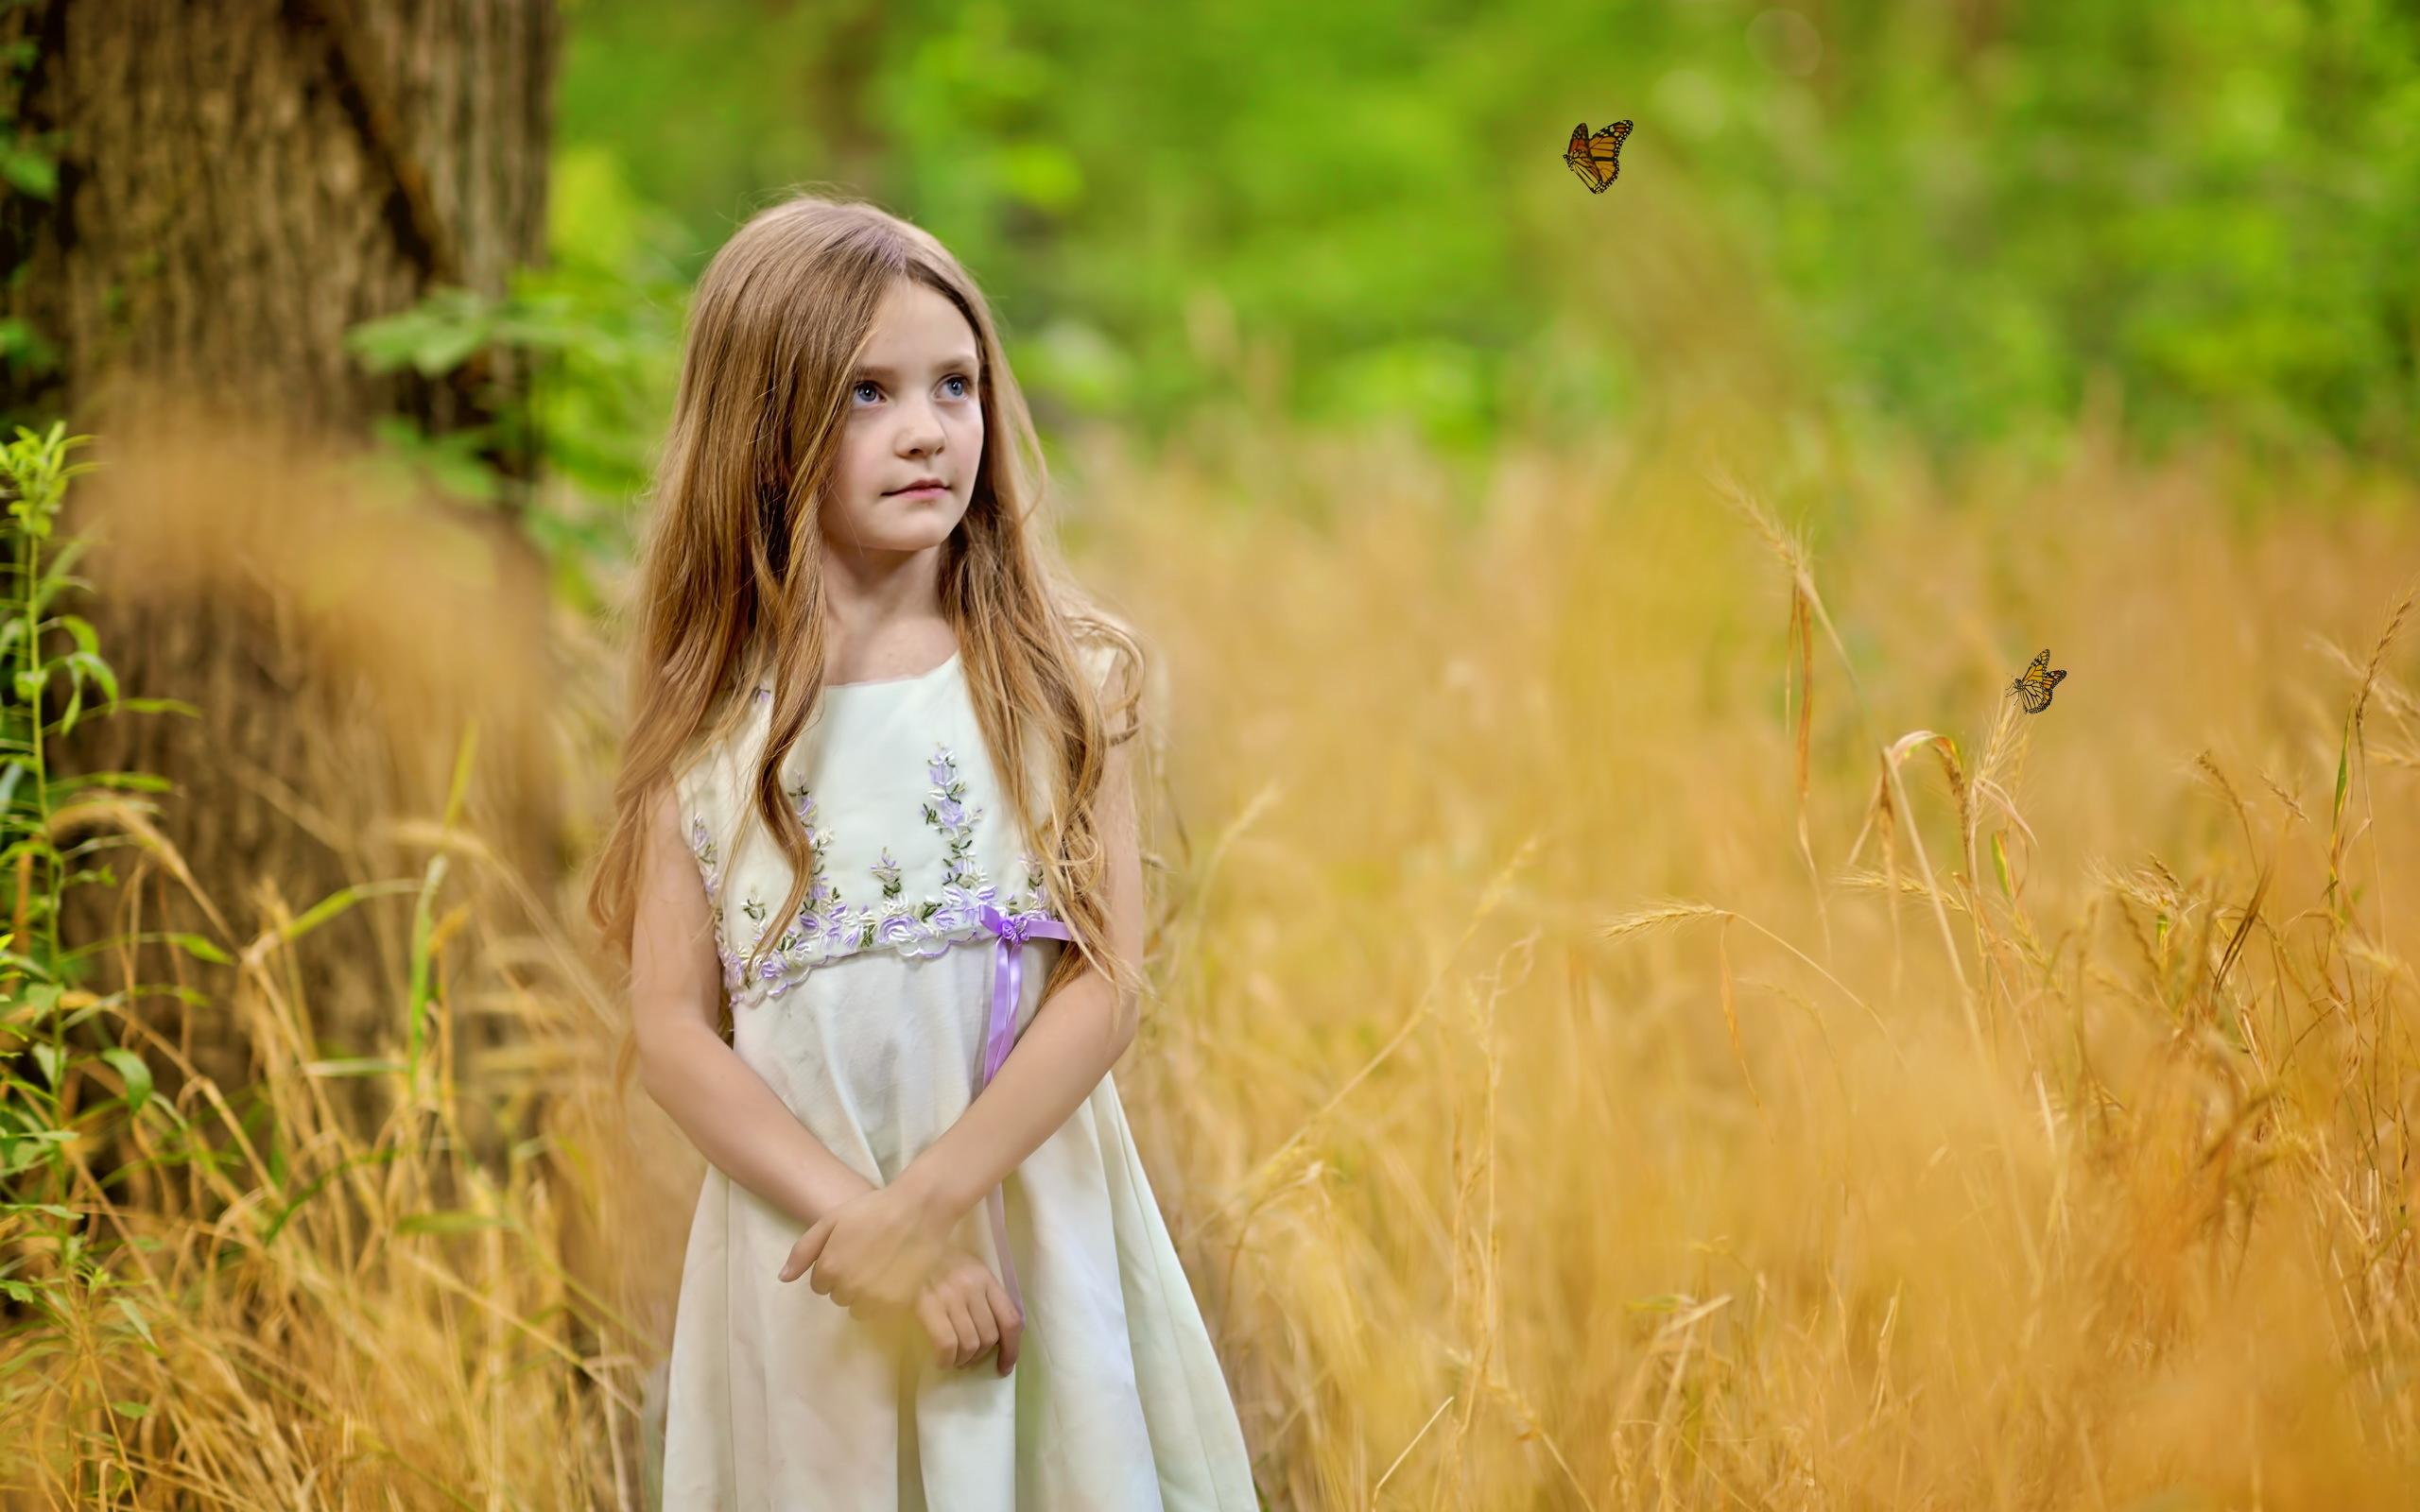 девочка, поле, бабочки